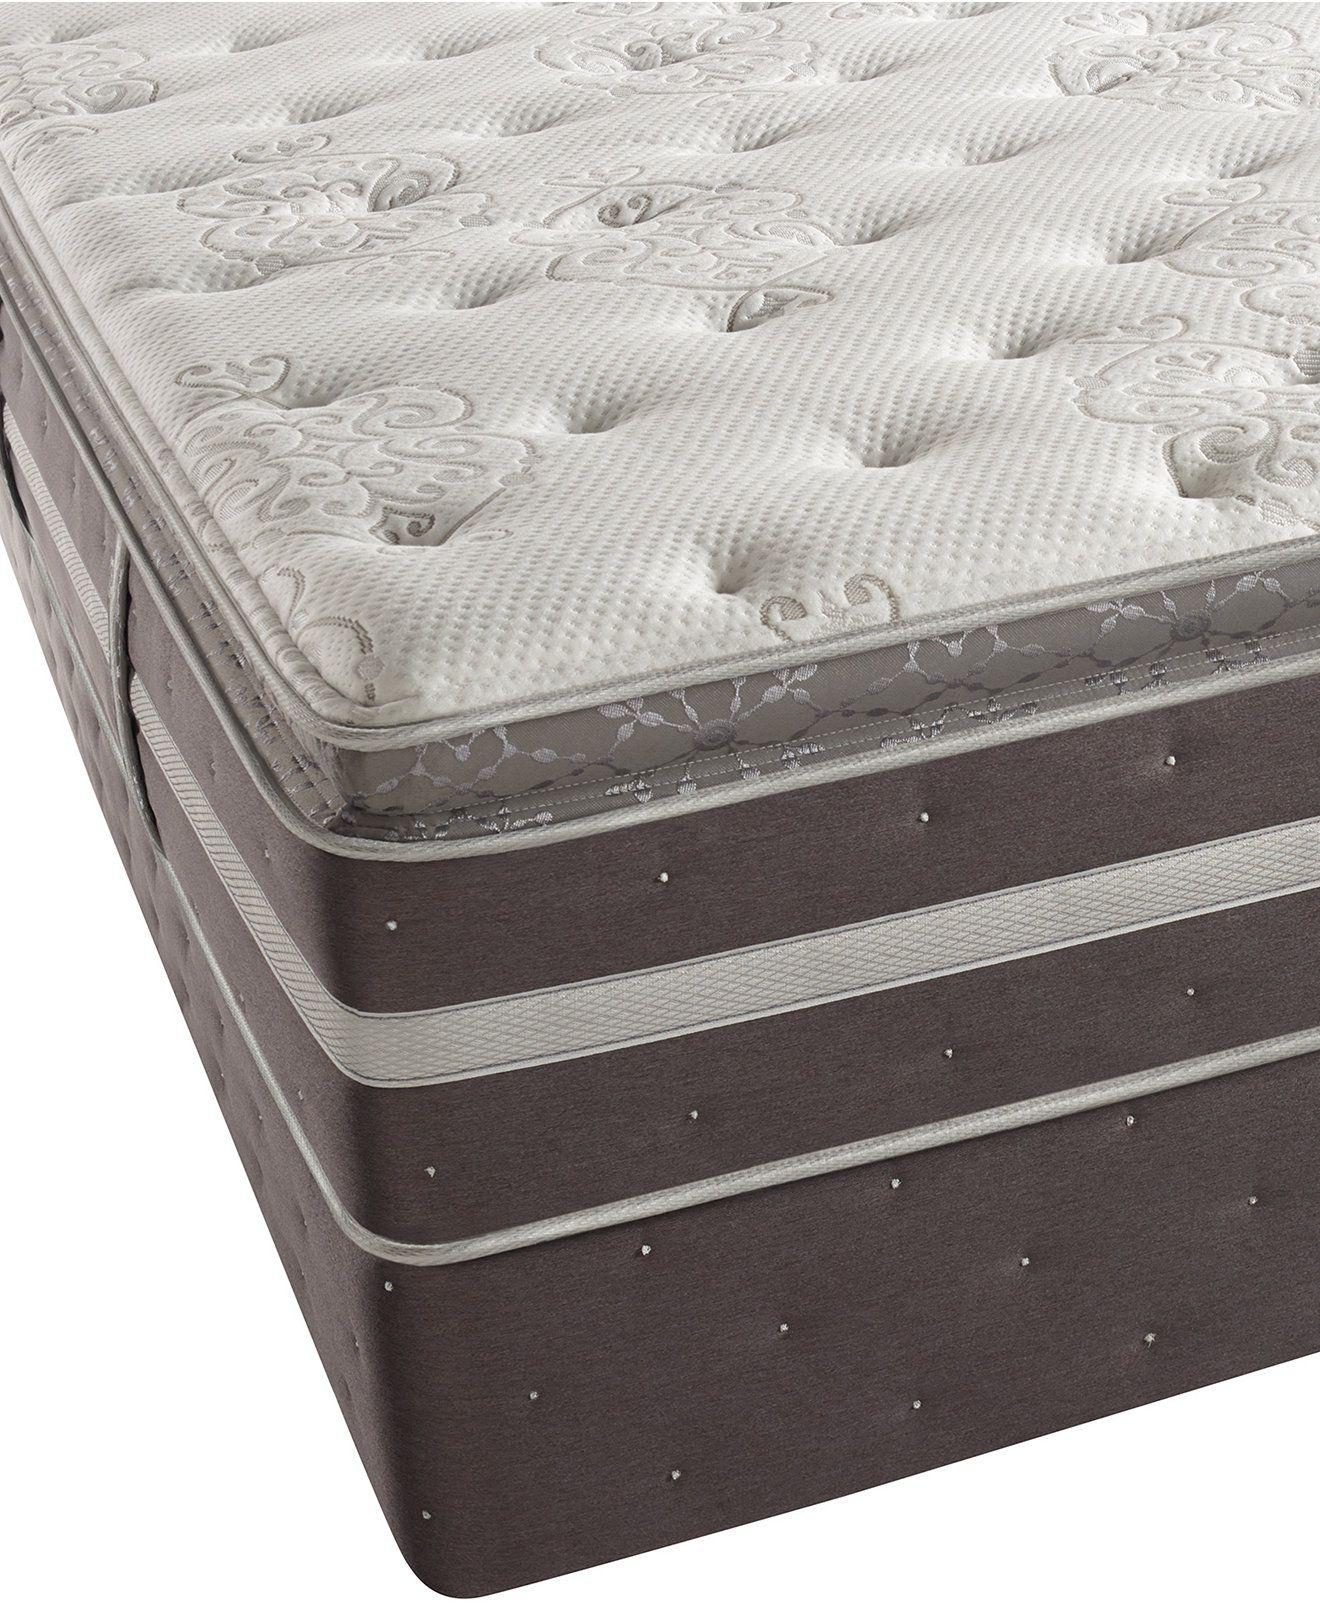 Beautyrest Recharge World Class Sonora Pillowtop Luxury Firm